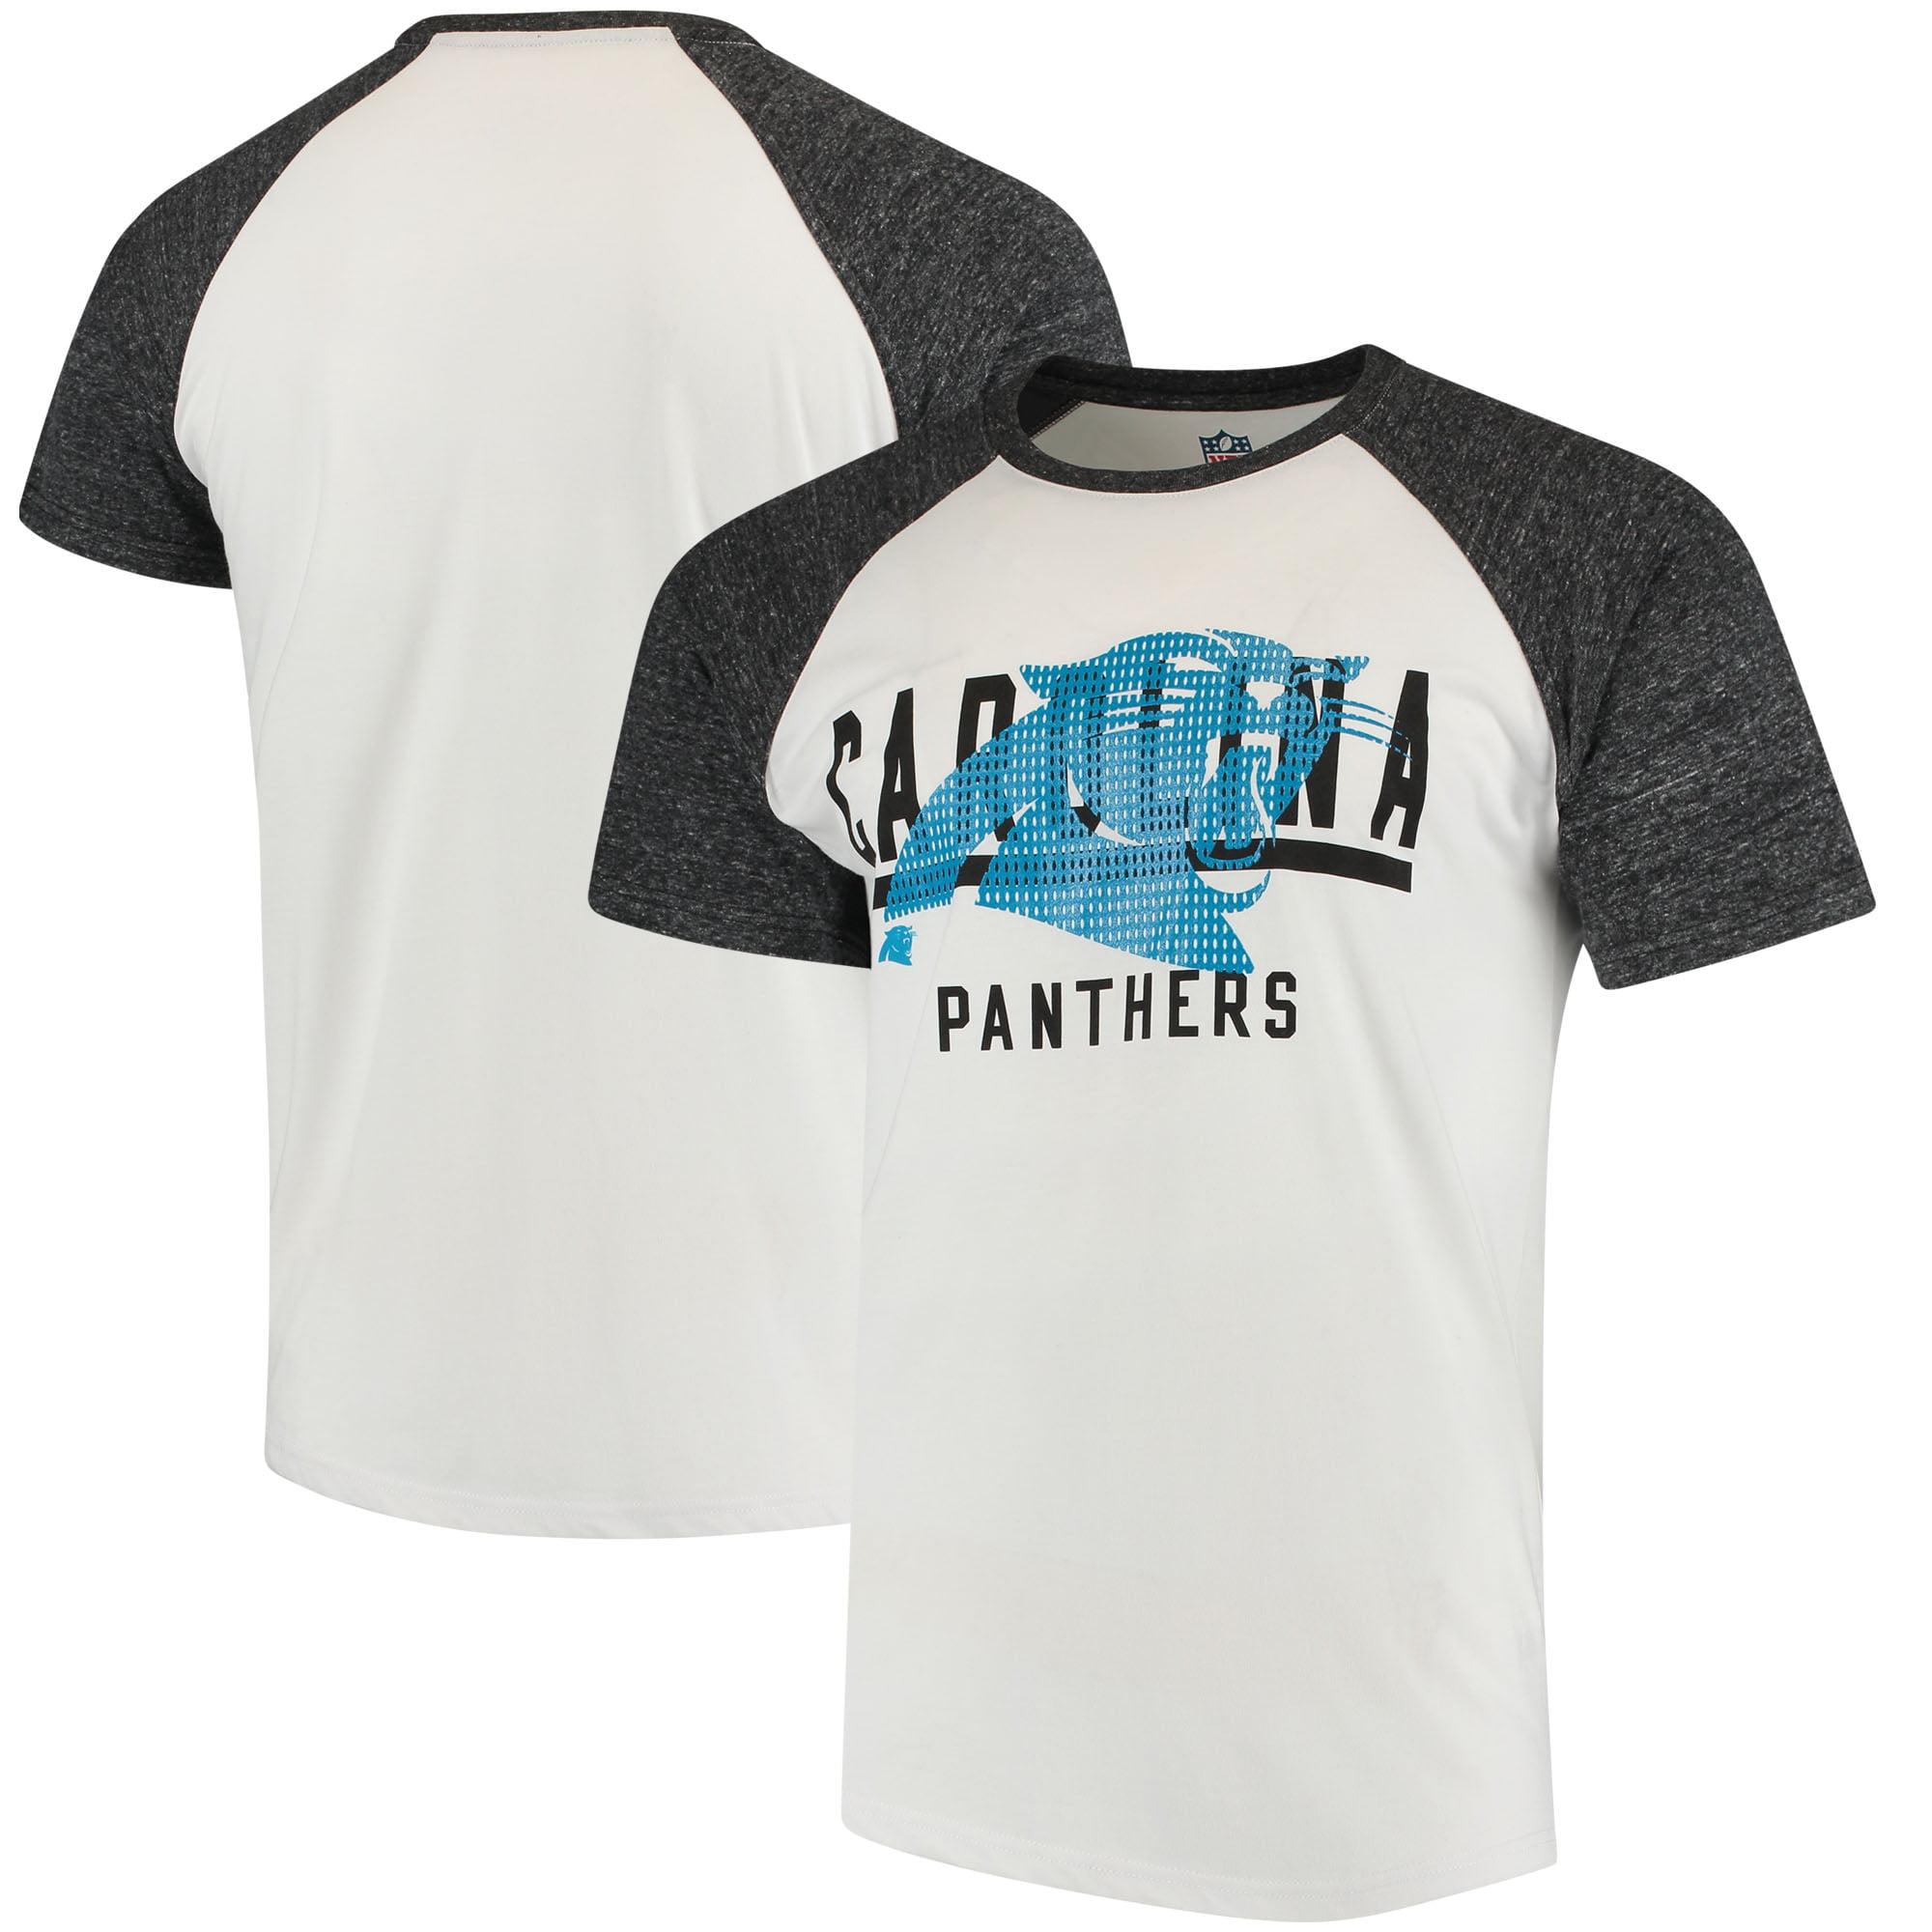 Carolina Panthers G-III Sports by Carl Banks Heritage Raglan Tri-Blend T-Shirt - White/Heathered Gray